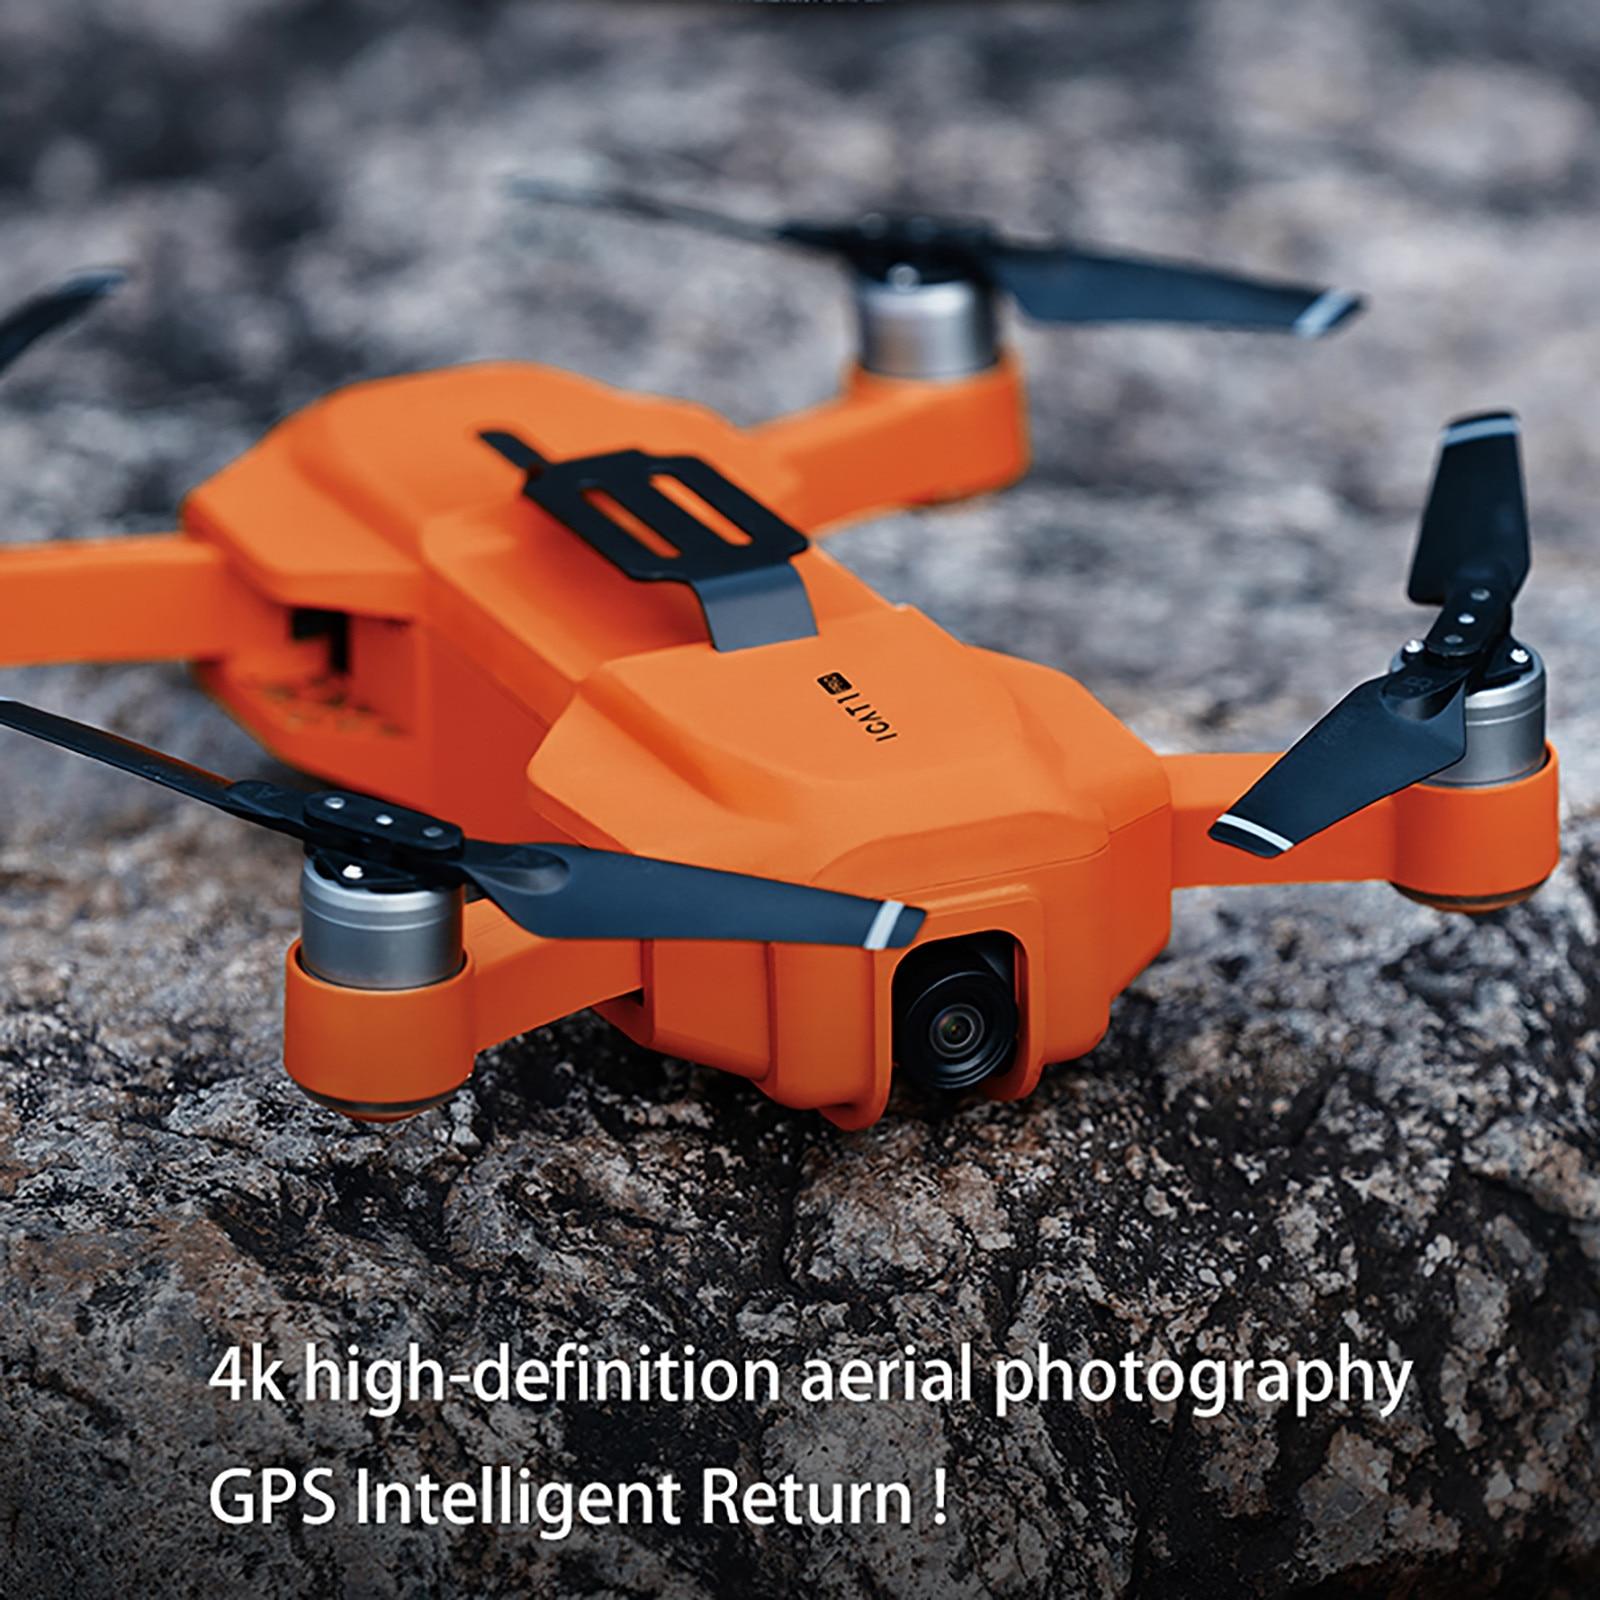 Dobrável Selfie Câmera de Vídeo Rc Quadcopter Drones Wi-fi Fpv 4k Hd Icat1 Pro Gps Zangão Zangão Квадракоптер С Камерой4k